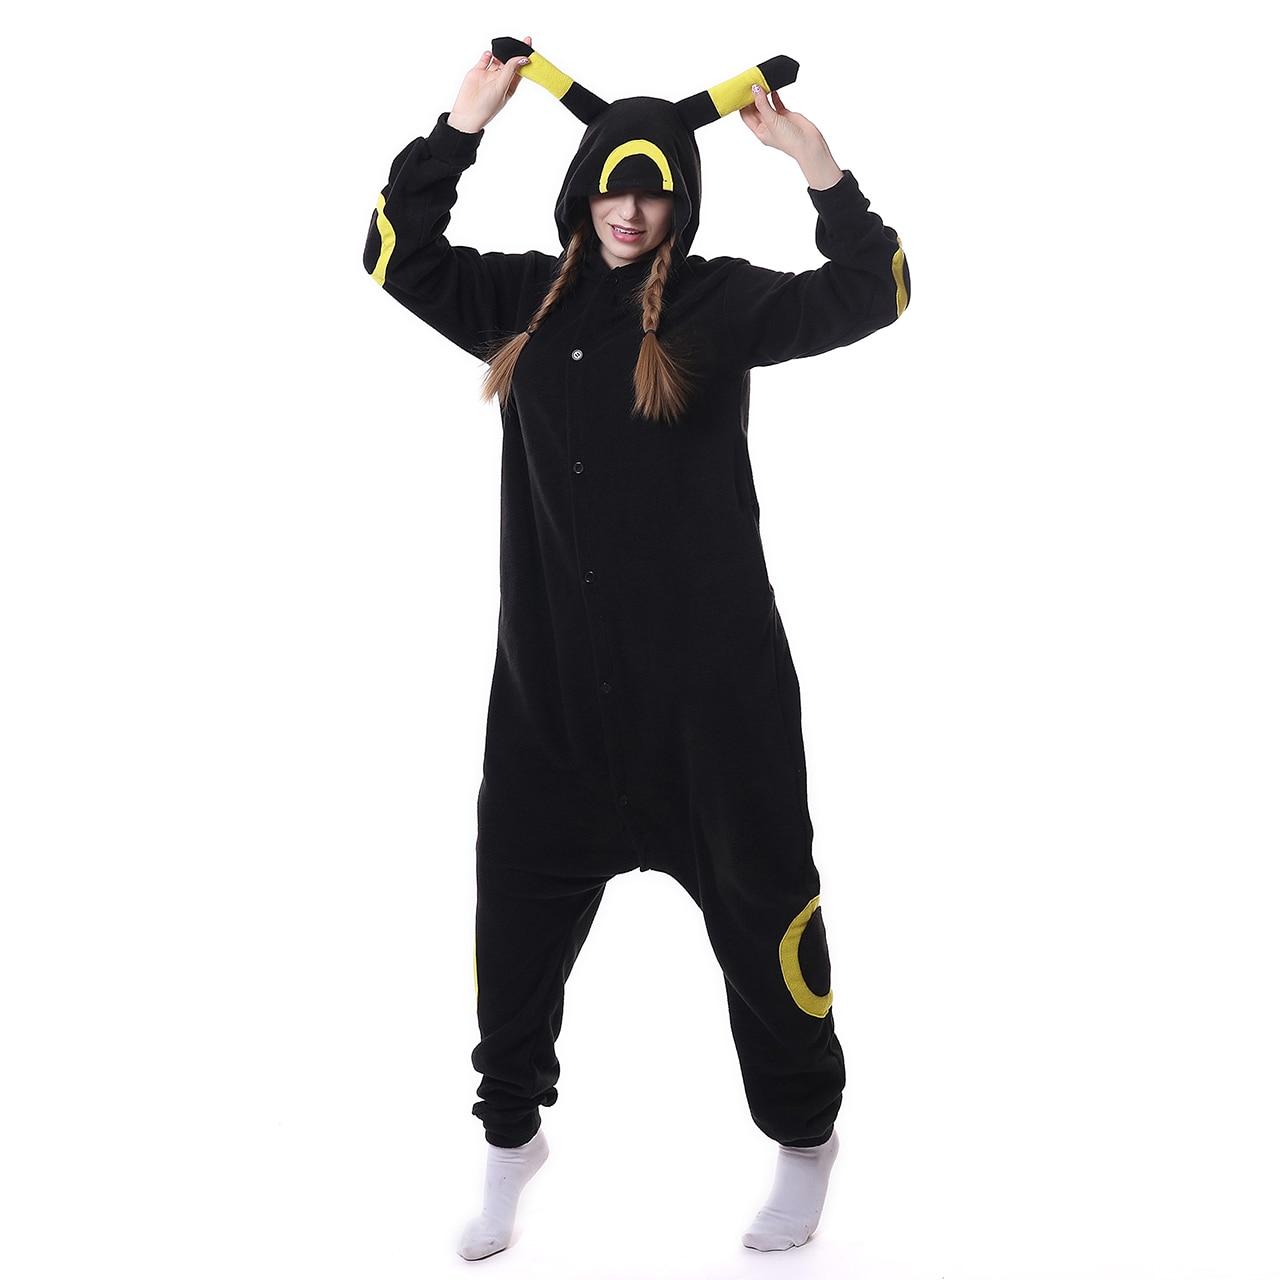 Kigurumi Cartoon Onesie Pokemon Cosplay Umbreon Pajamas Girl Women Adult Black Sleepwear Party Jumpsuit Winter Sleep Overalls XL